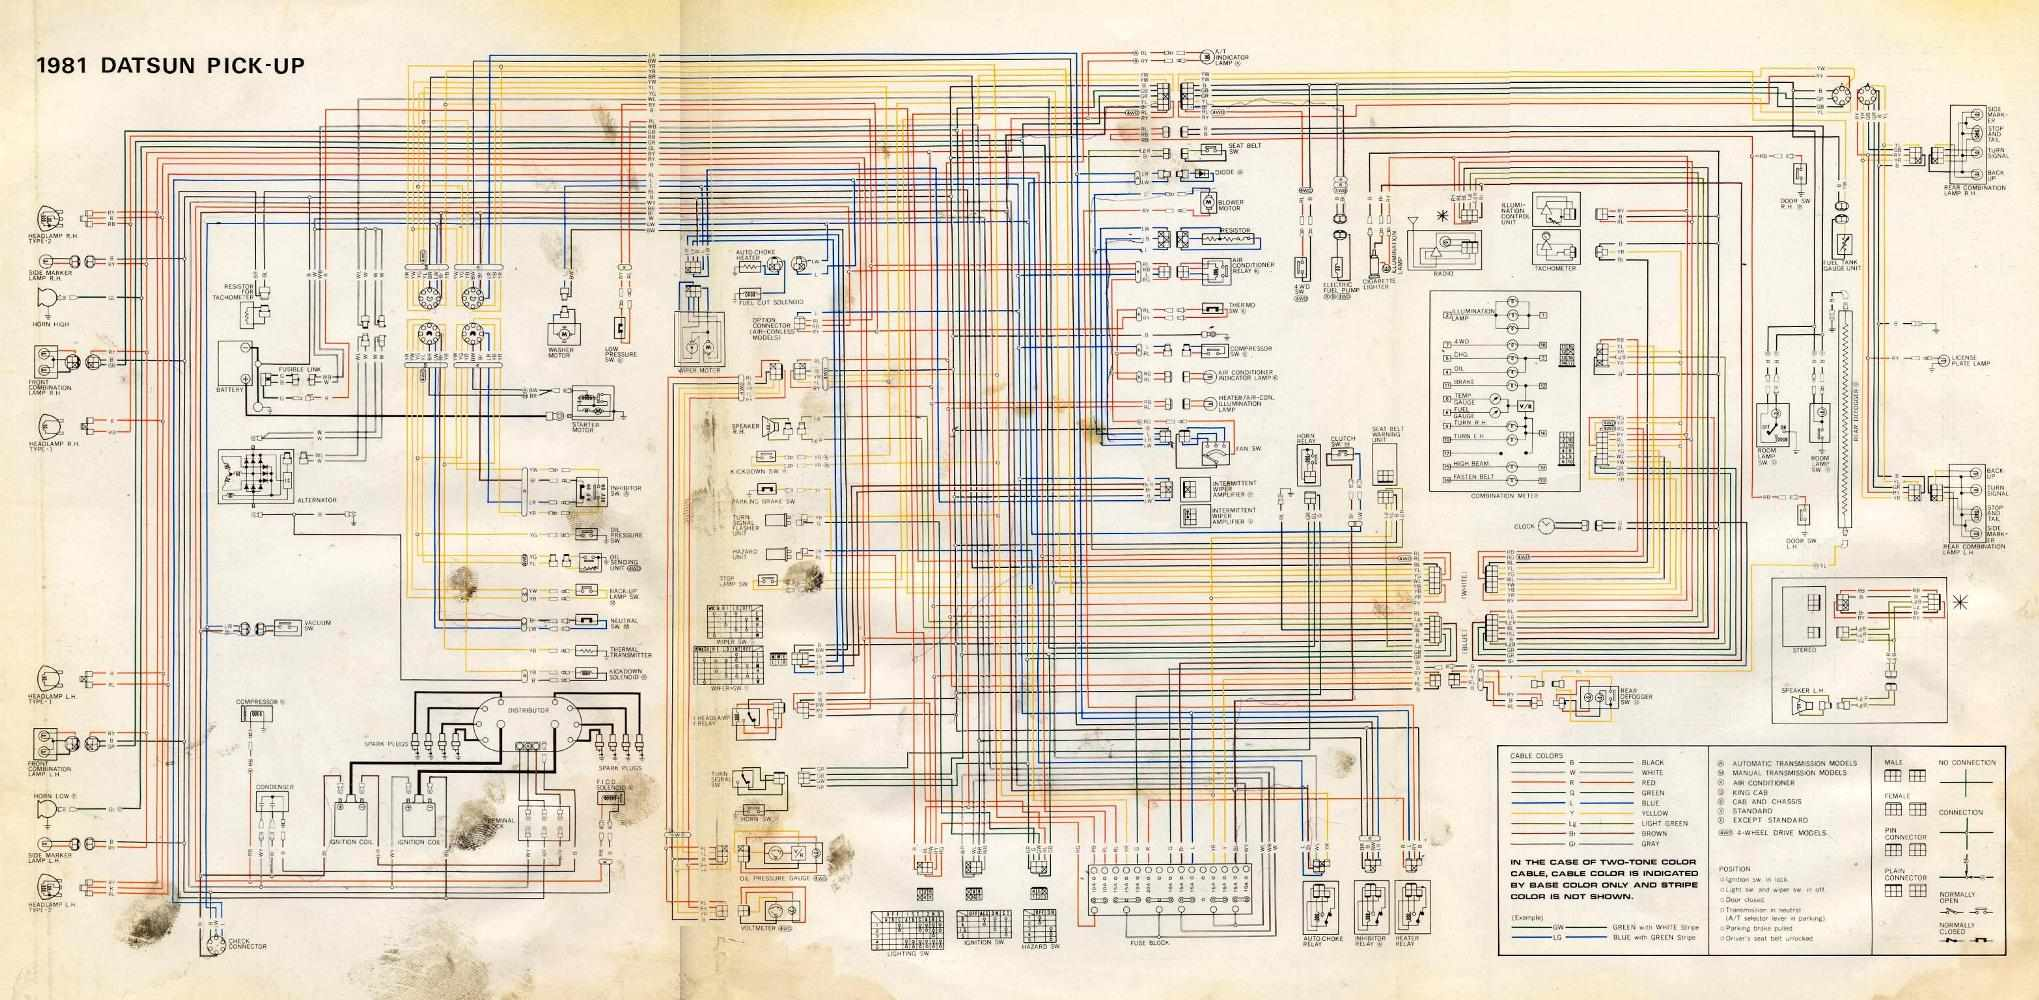 Alternator Wiring Diagram For Farmtrac 675 List Of Schematic Diagrams Car App Auto Electrical Rh Stanford Edu Uk Co Gov Hardtobelieve Me